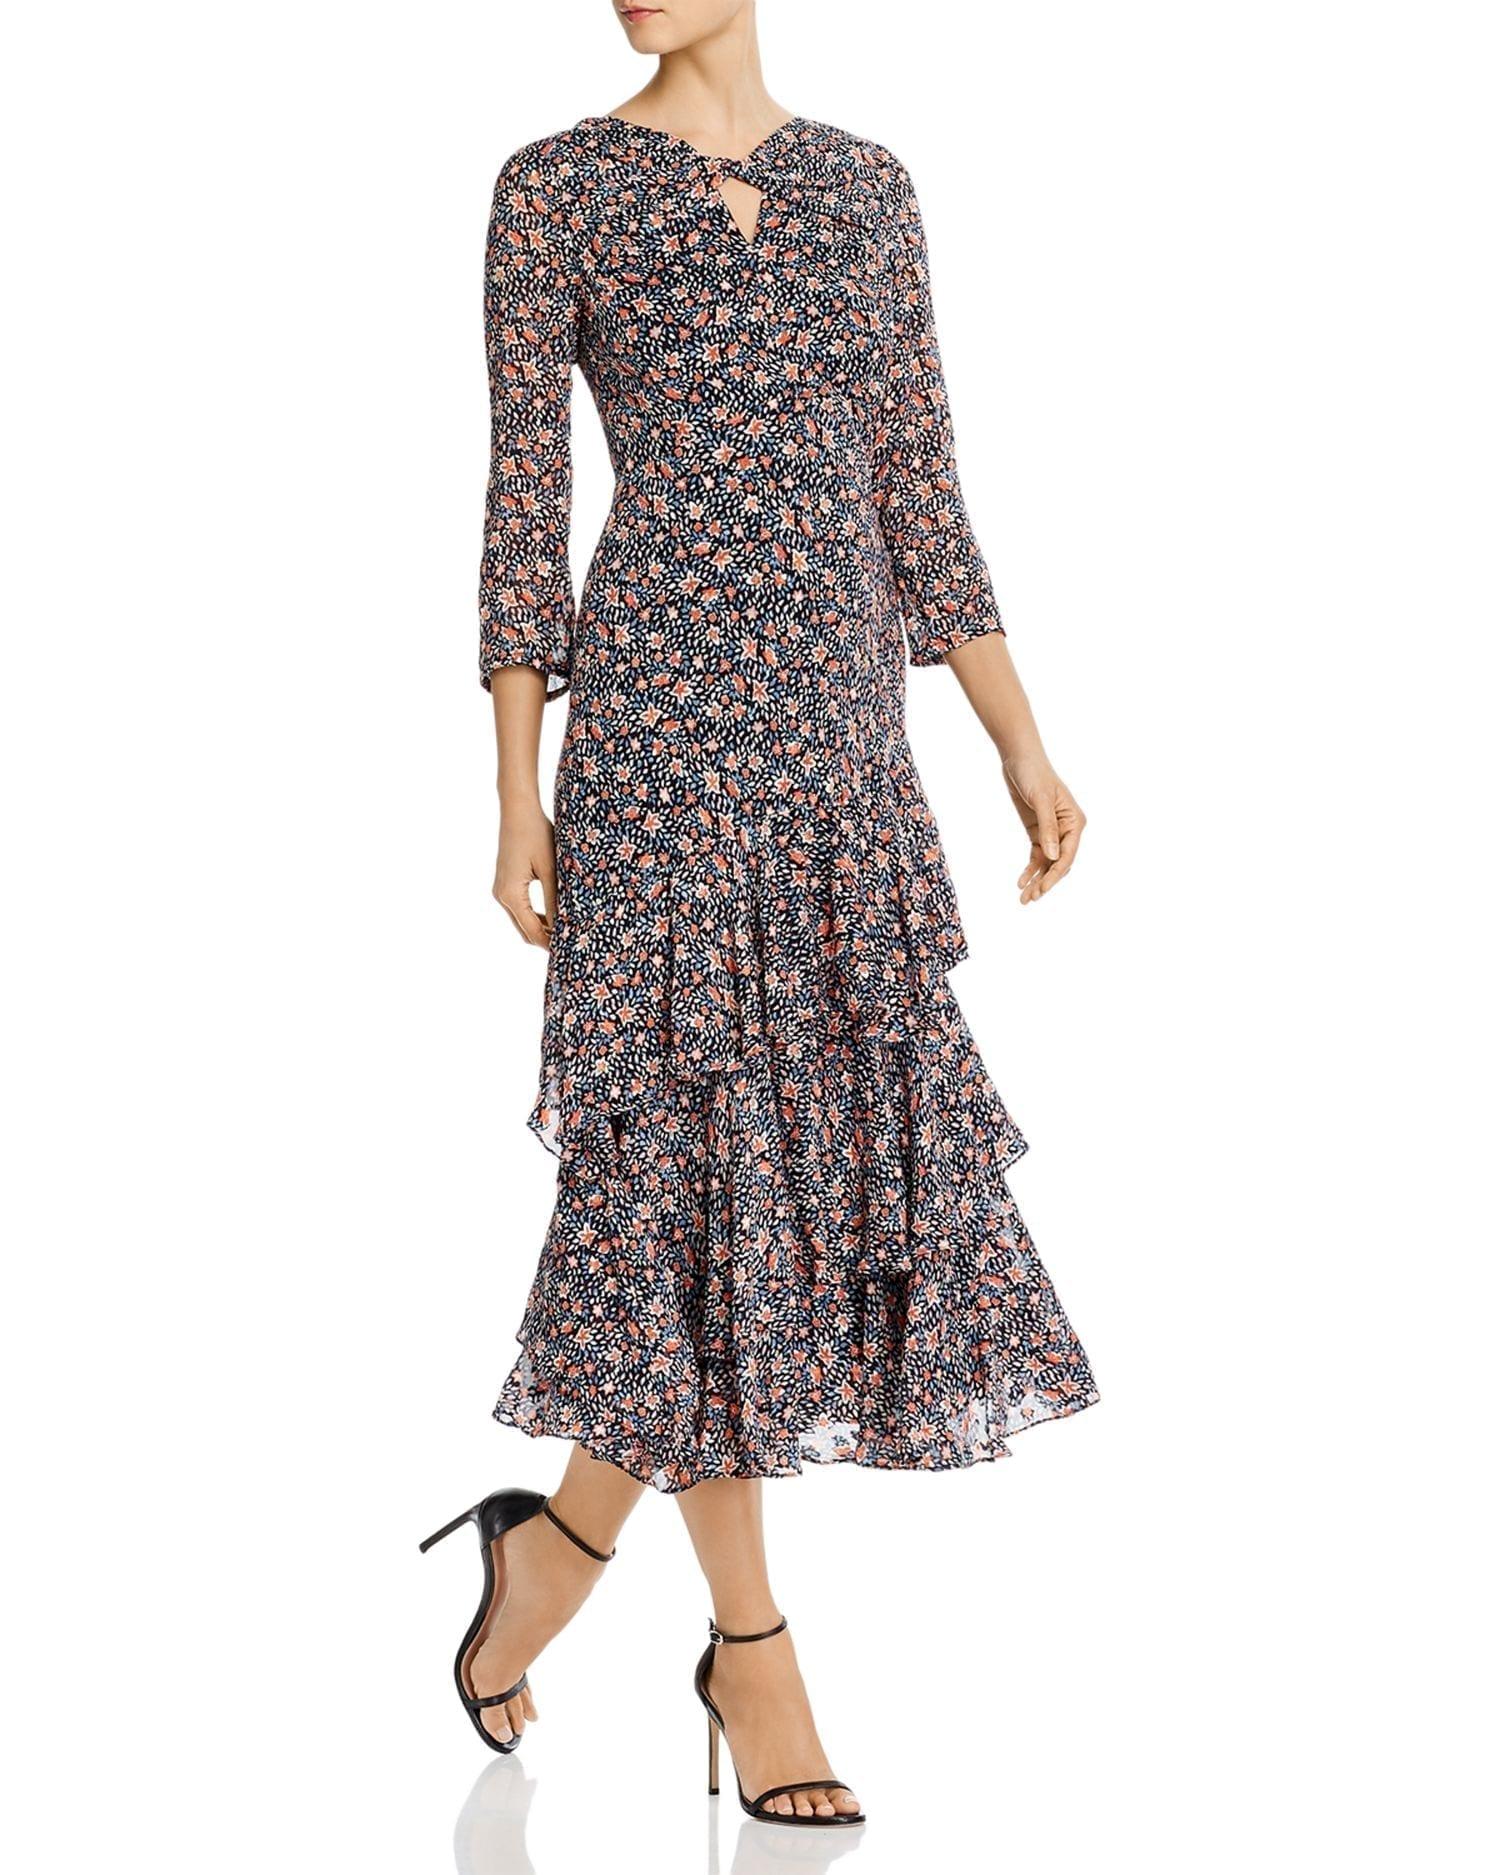 REBECCA TAYLOR Twilight Ruffled Dress